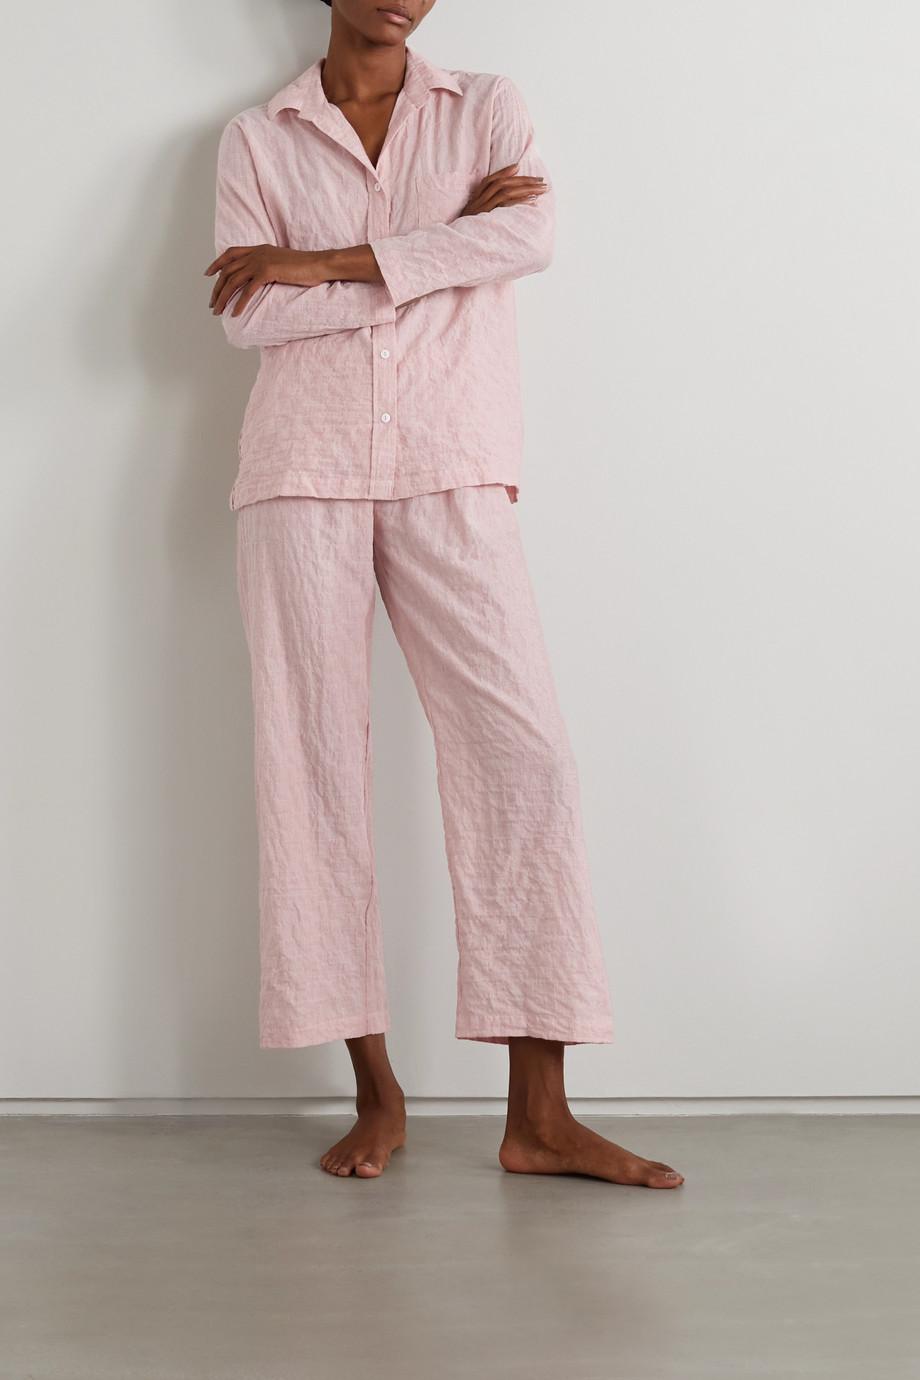 Pour Les Femmes Pyjama aus Biobaumwoll-Voile in Knitteroptik